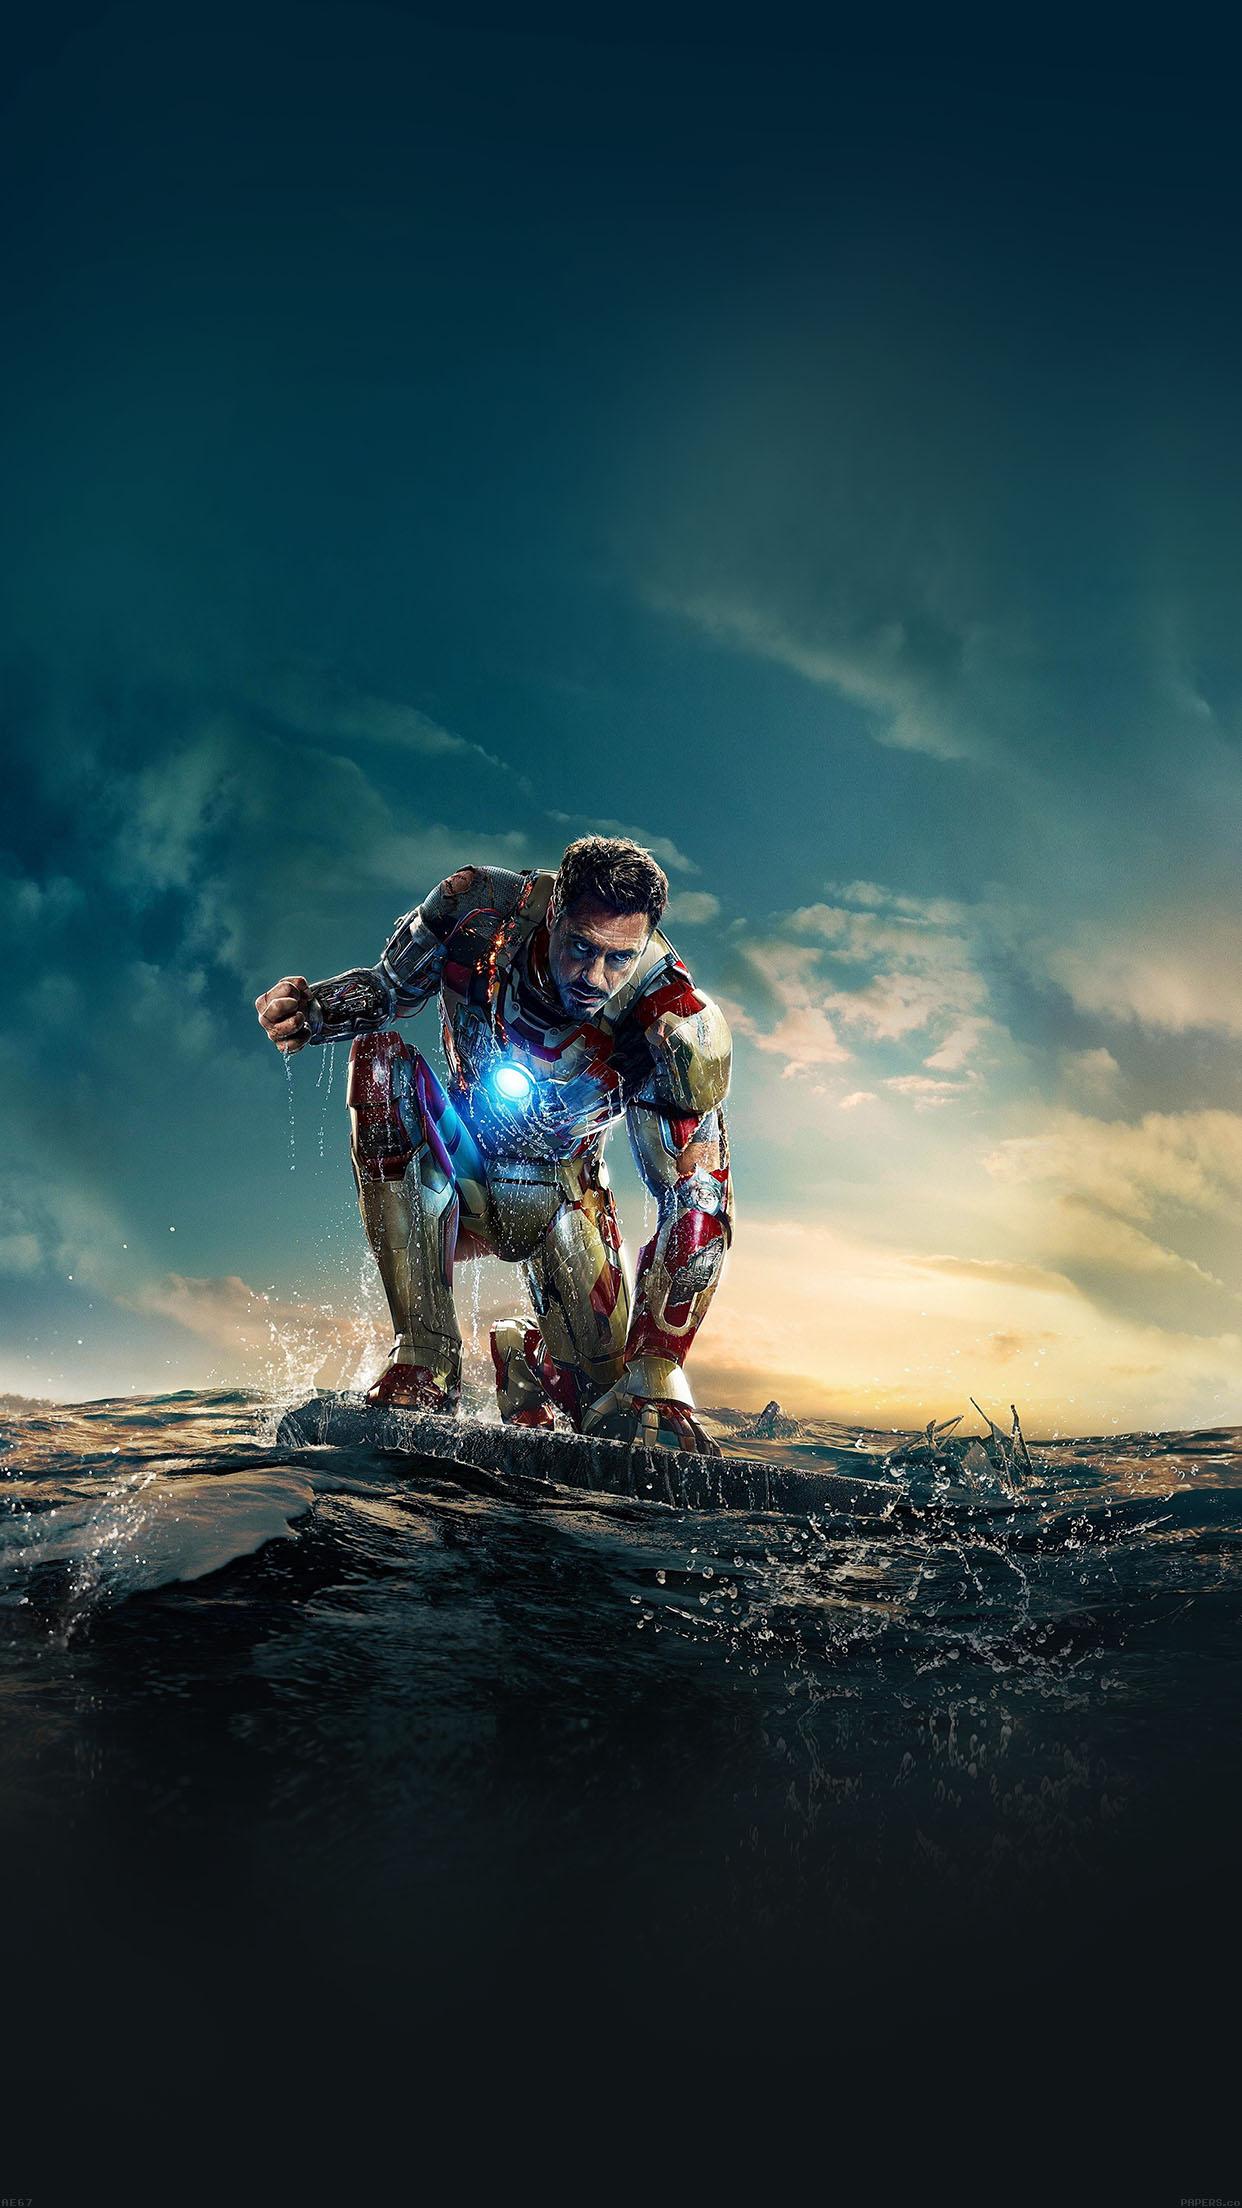 Ae67 Ironman Angry In Hero Poseture Art